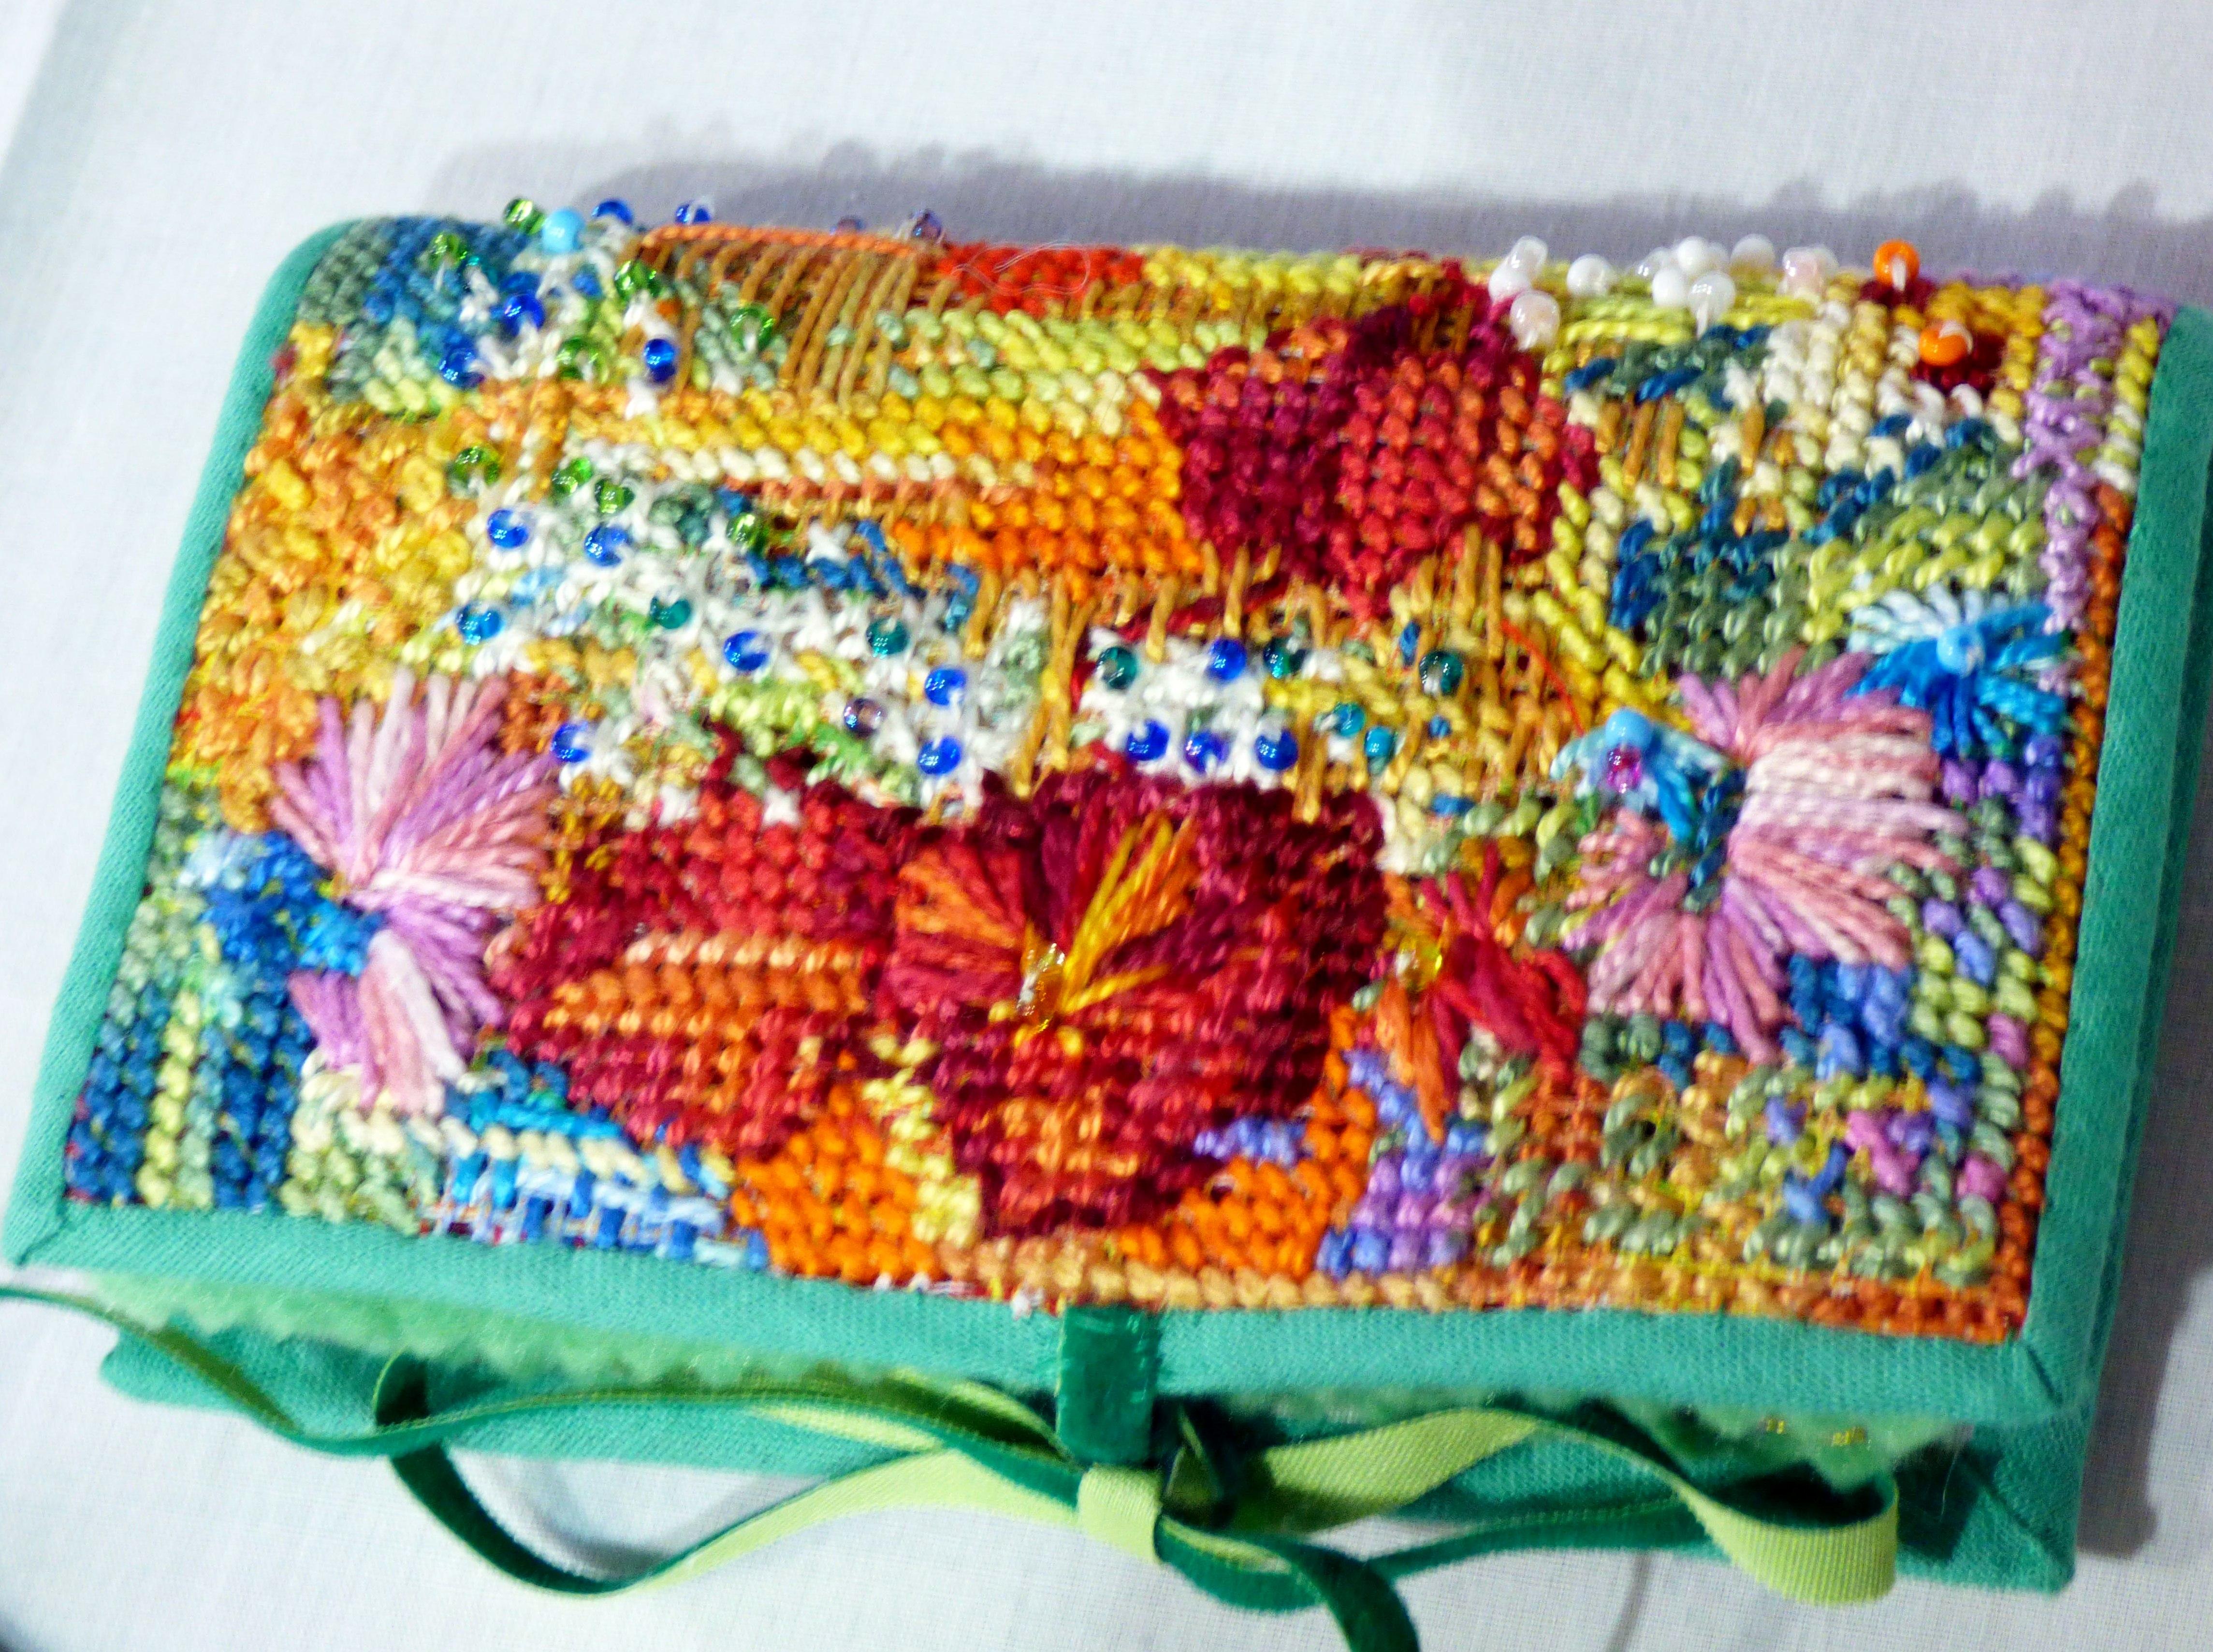 TRELLIS AND FLOWERS NEEDLECASE by Jannette Nicholas, N.Wales EG, embellished needlepoint on canvas